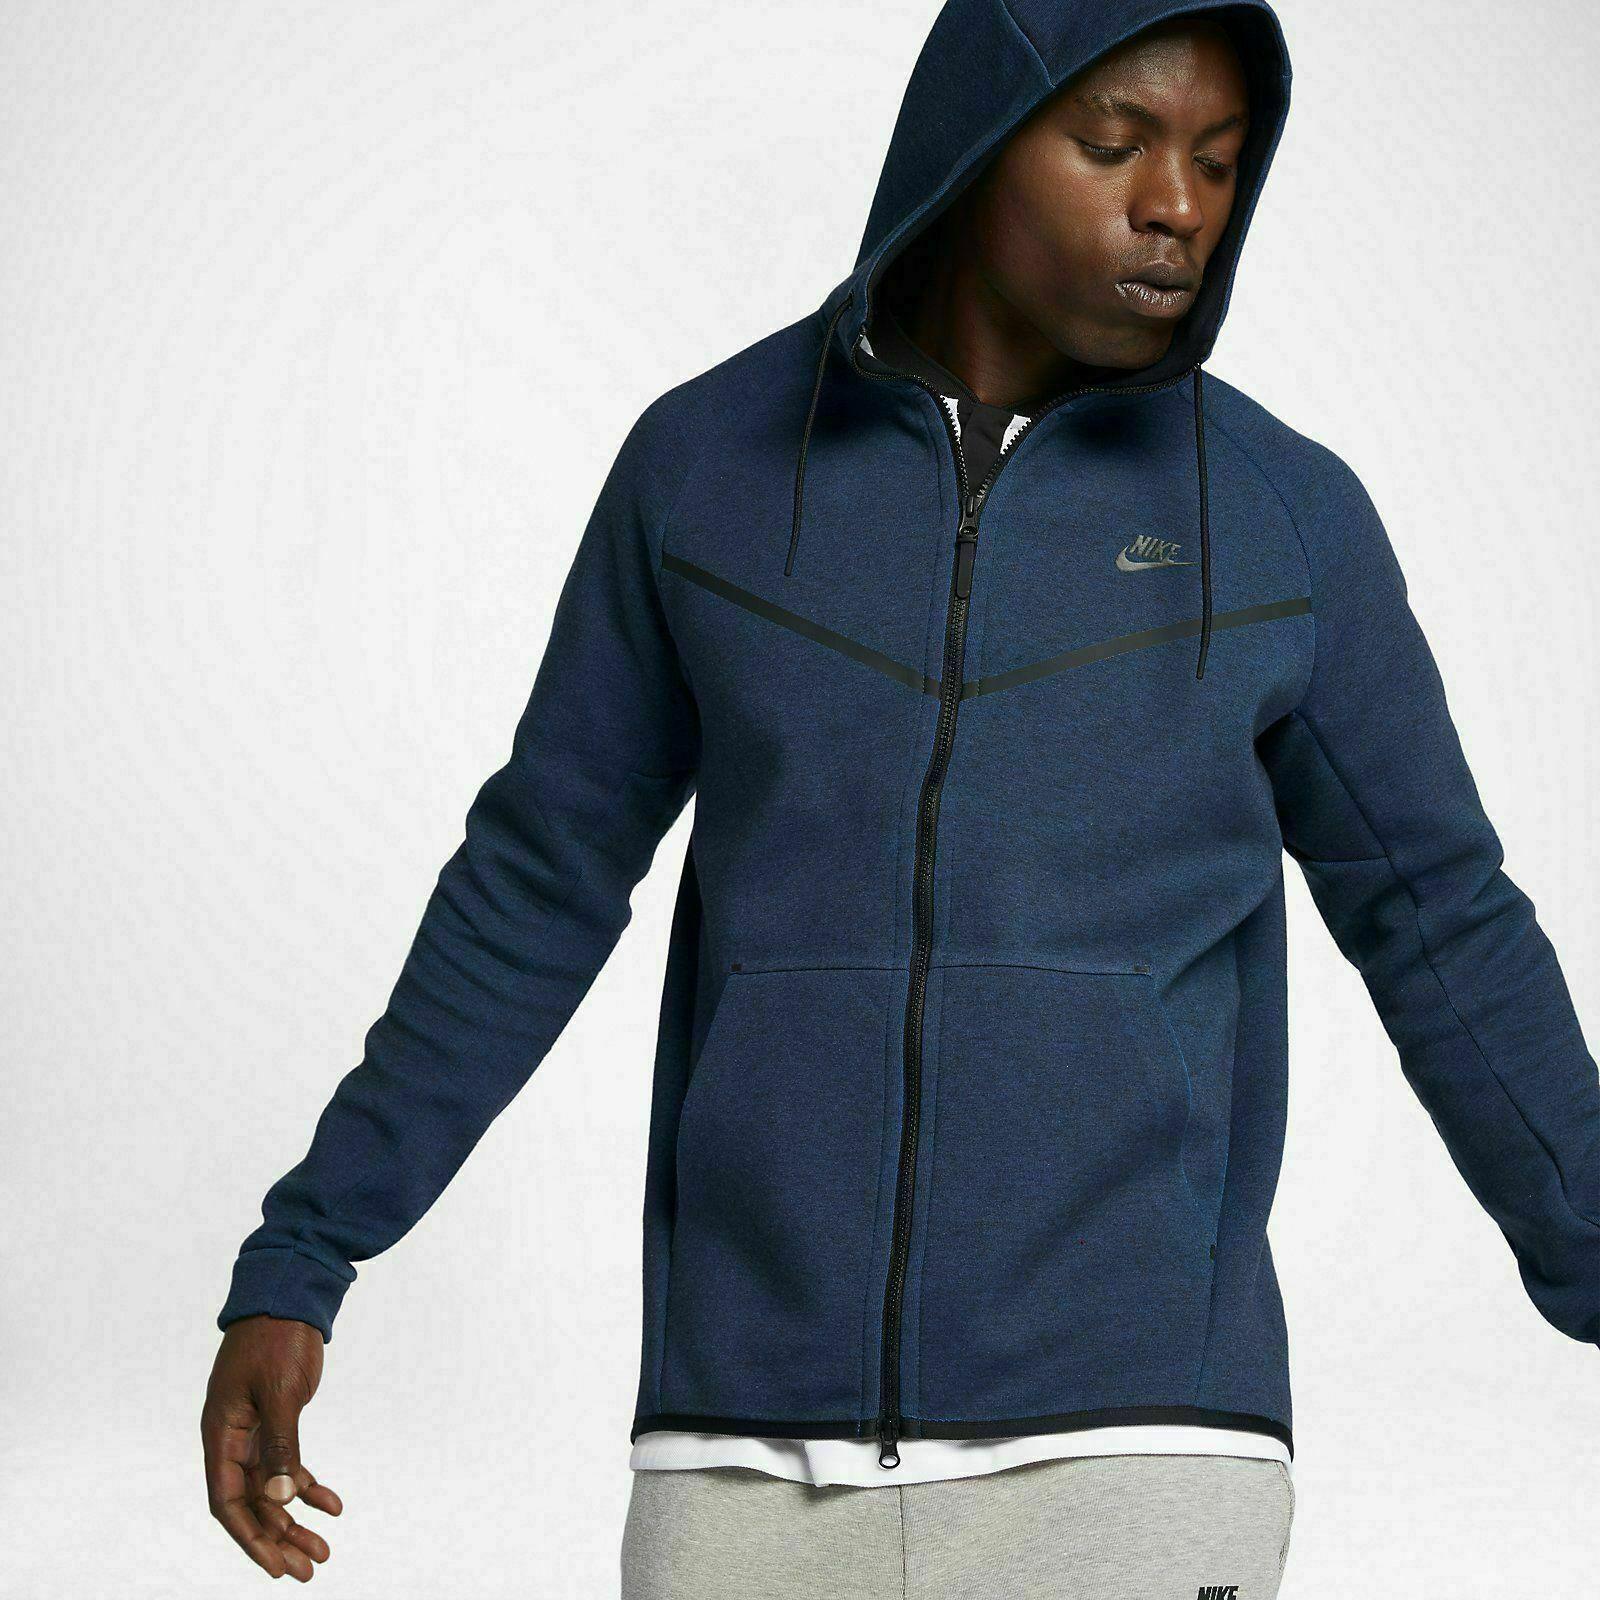 Men S Nike Tech Fleece Windrunner Obsidian Blue Black Jacket 559592 473 Small For Sale Online Ebay